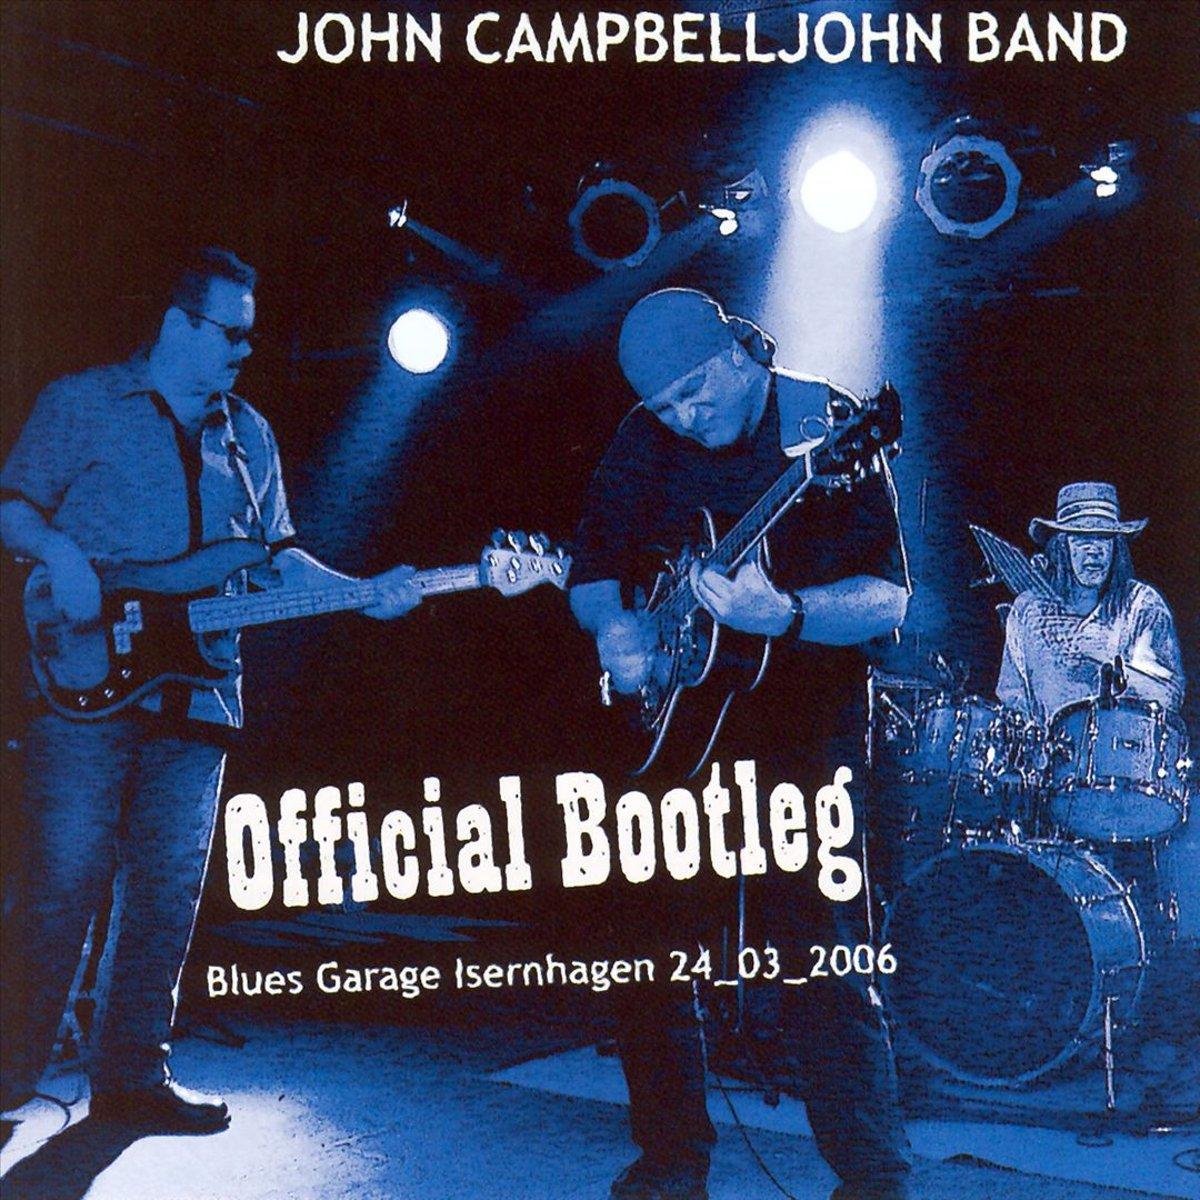 John Campbelljohn. Official Bootleg: 24 03 2006